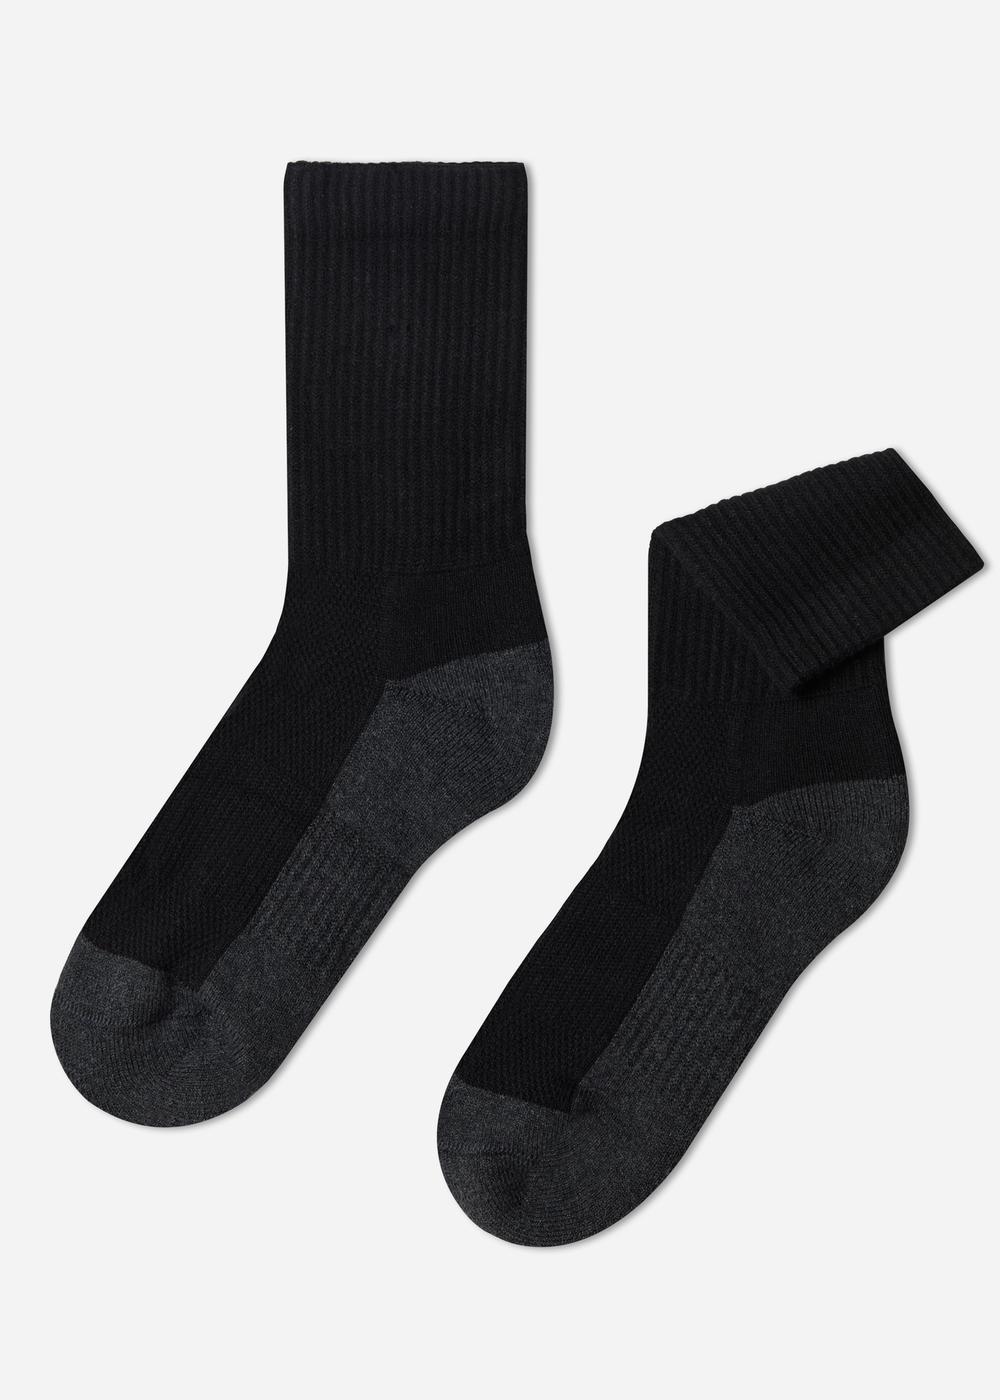 Short Unisex Sports Socks